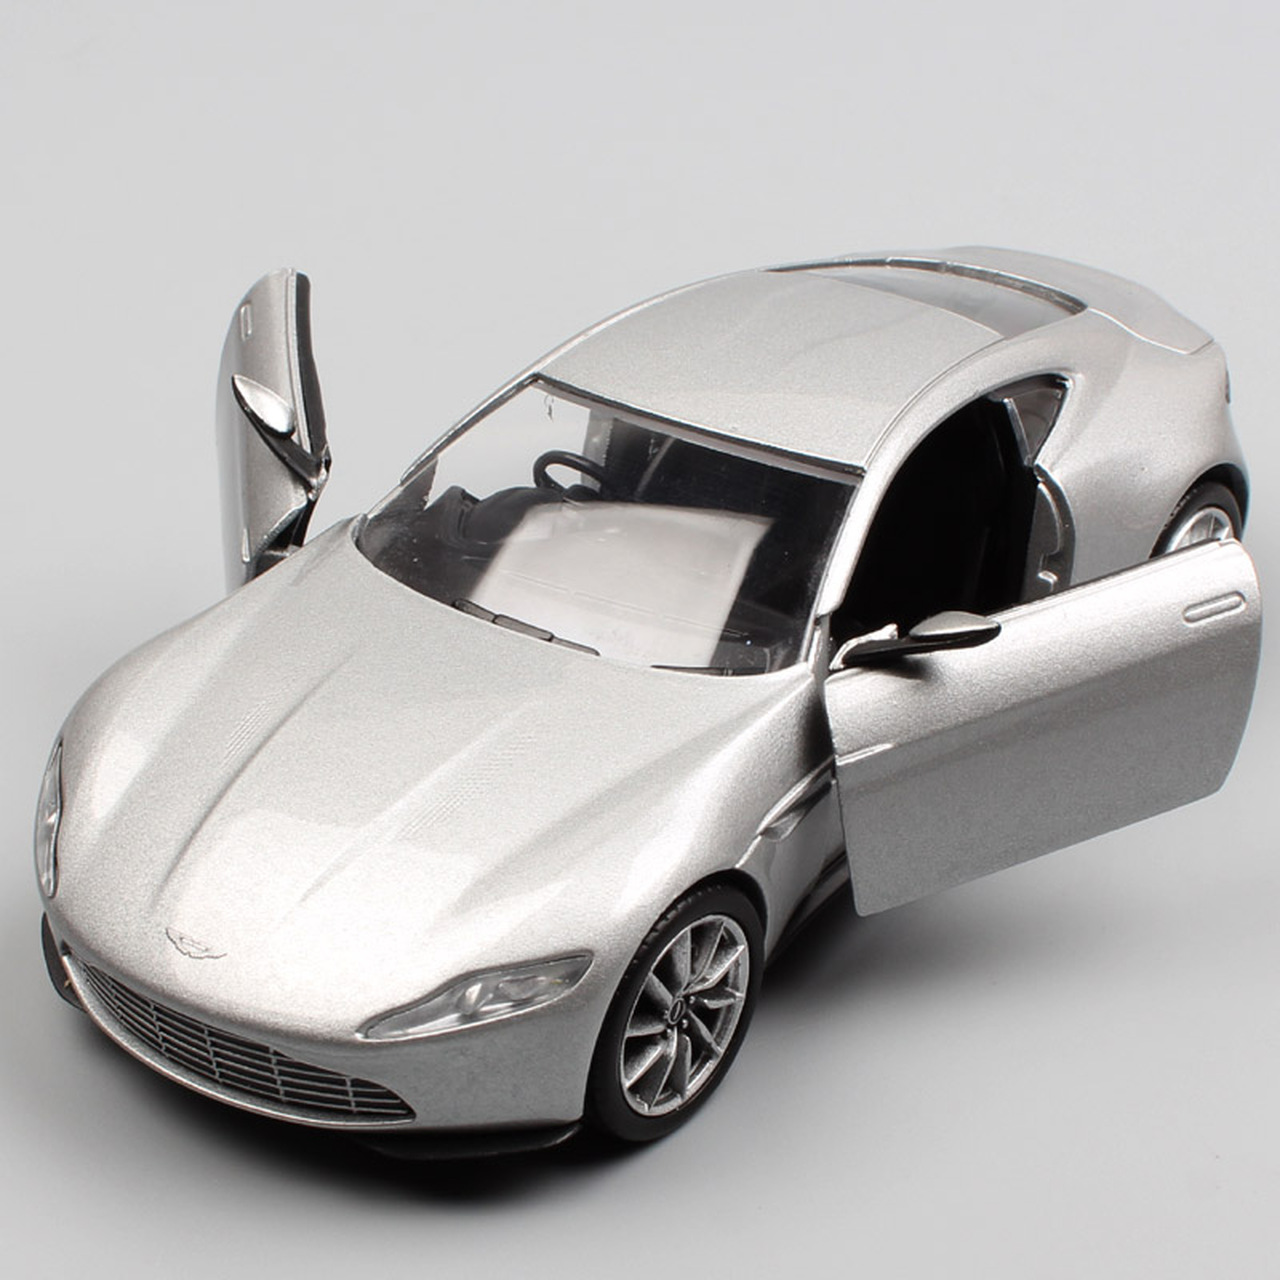 1 36 Scale Corgi Aston Martin Db10 James Bond 007 Spectre Concept Car Sports Coupe Diecast Vehicles Model Toy Gift For Child Boy